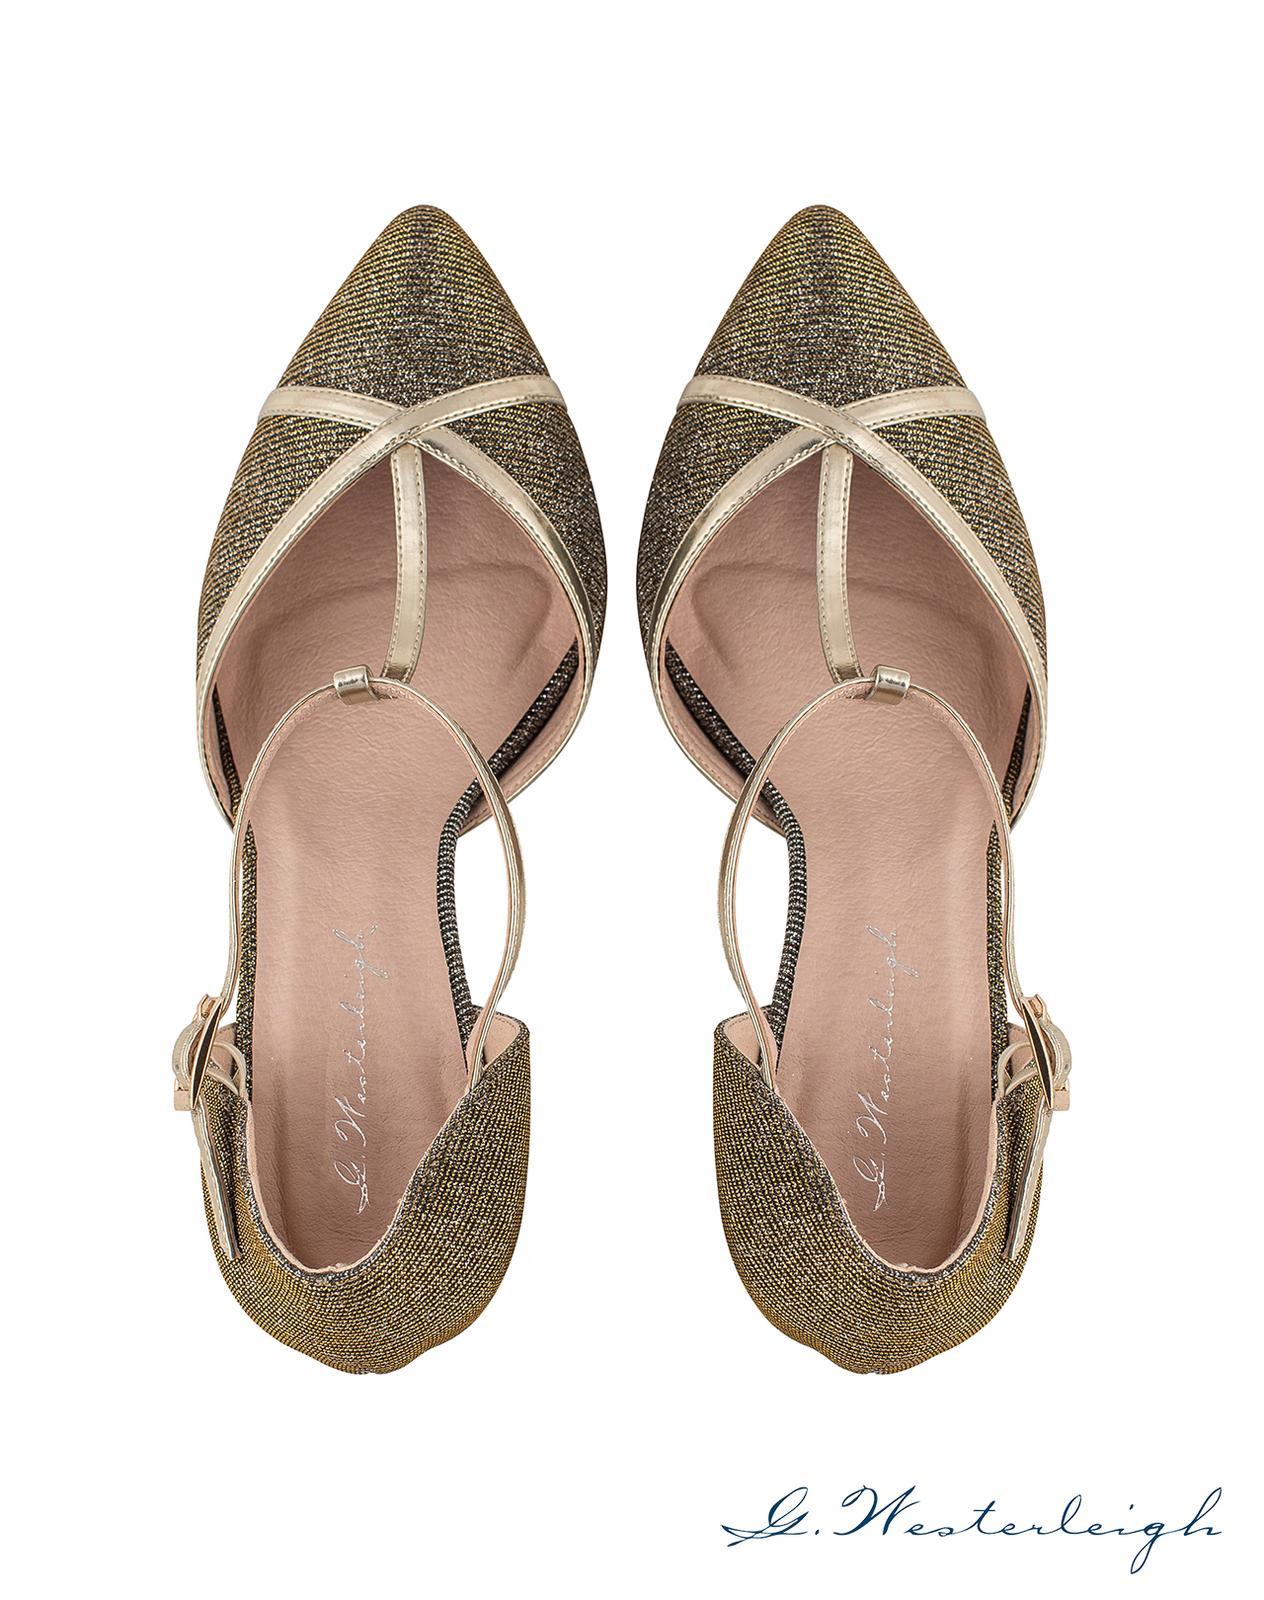 Spoločenské topánky Zaragoza - Obrázok č. 3